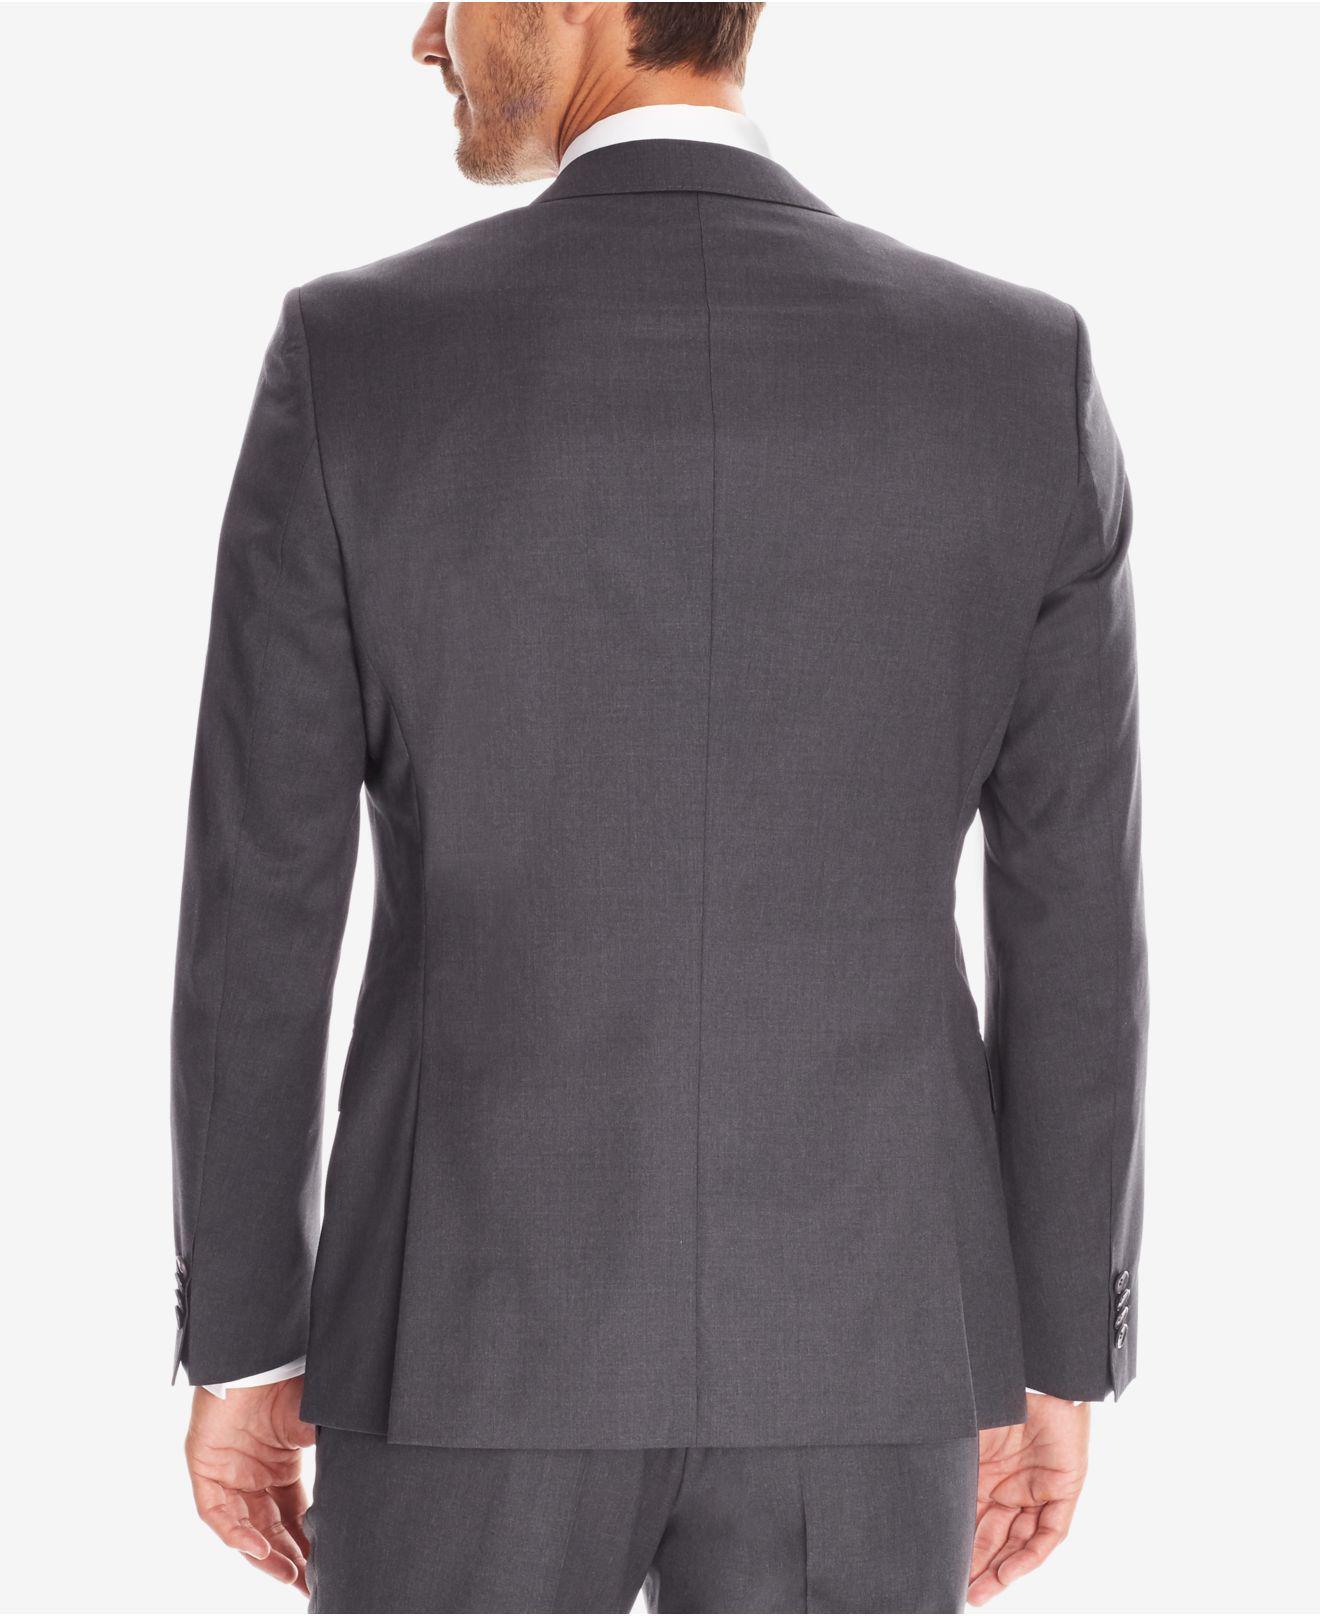 be0b4ea1 Lyst - BOSS Men's Slim-fit Super 120 Italian Virgin Wool Sport Coat in Gray  for Men